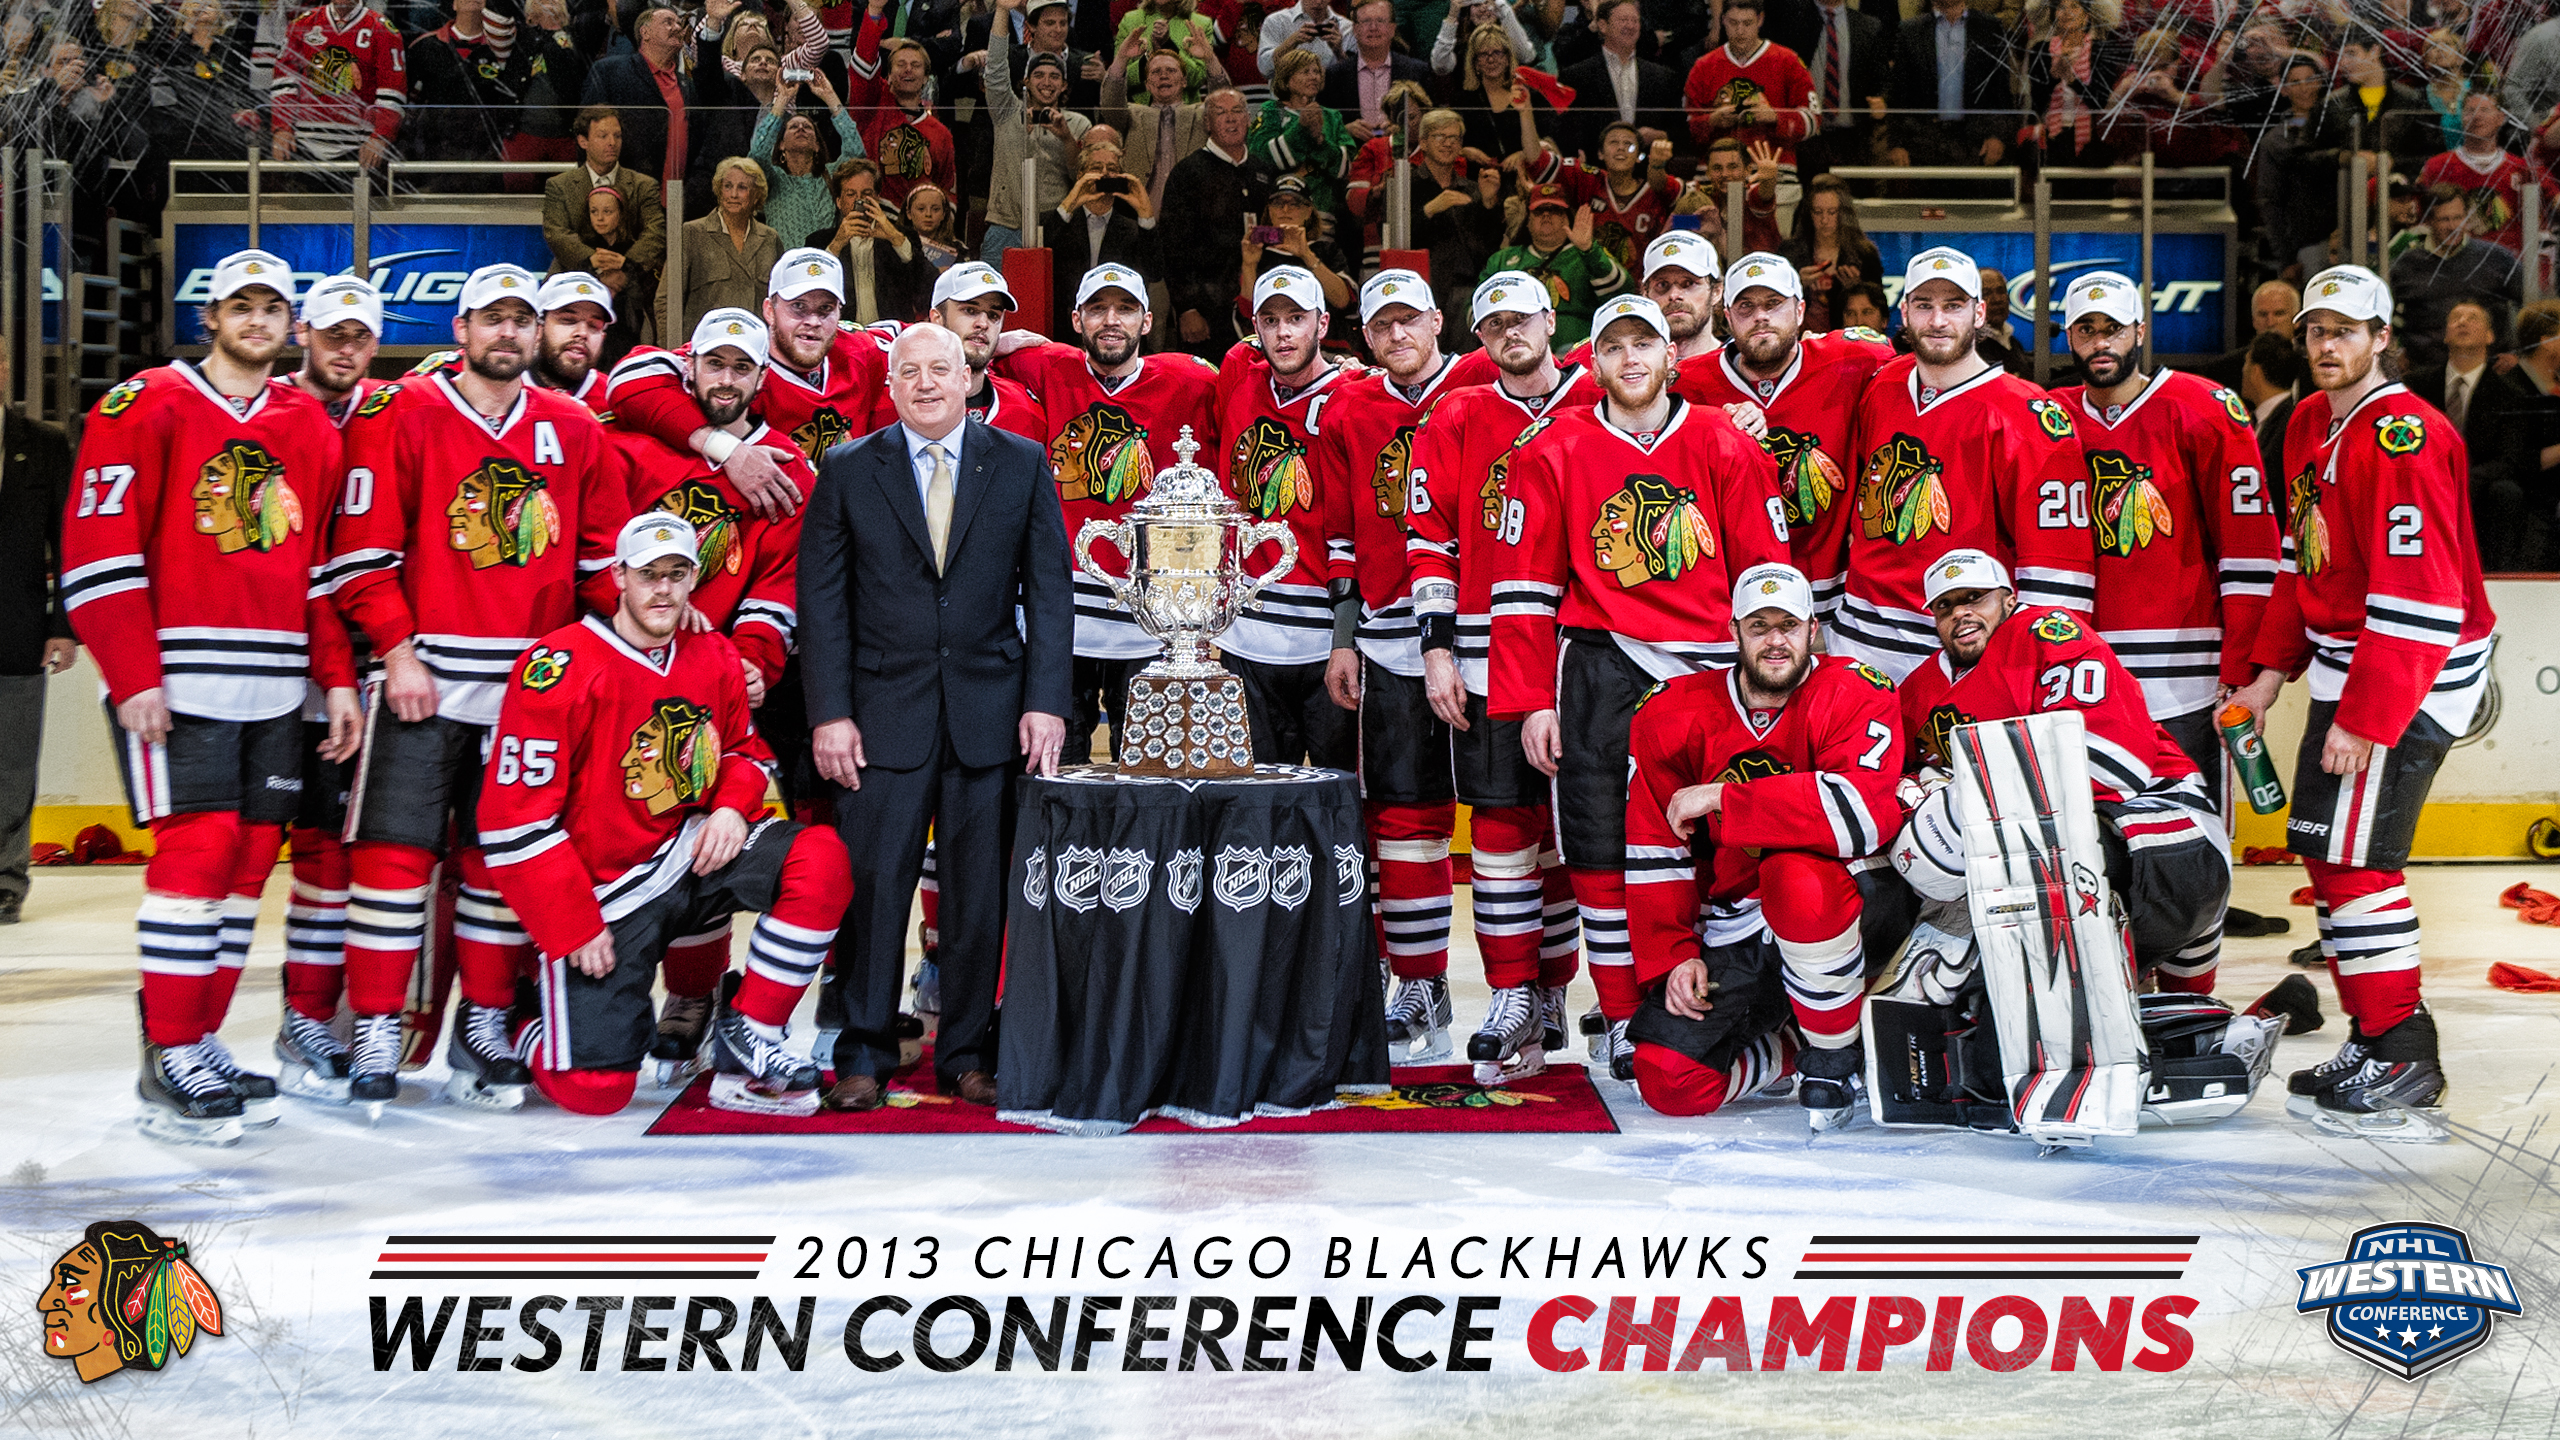 Blackhawks Wallpaper Stanley Cup - 3894.2KB